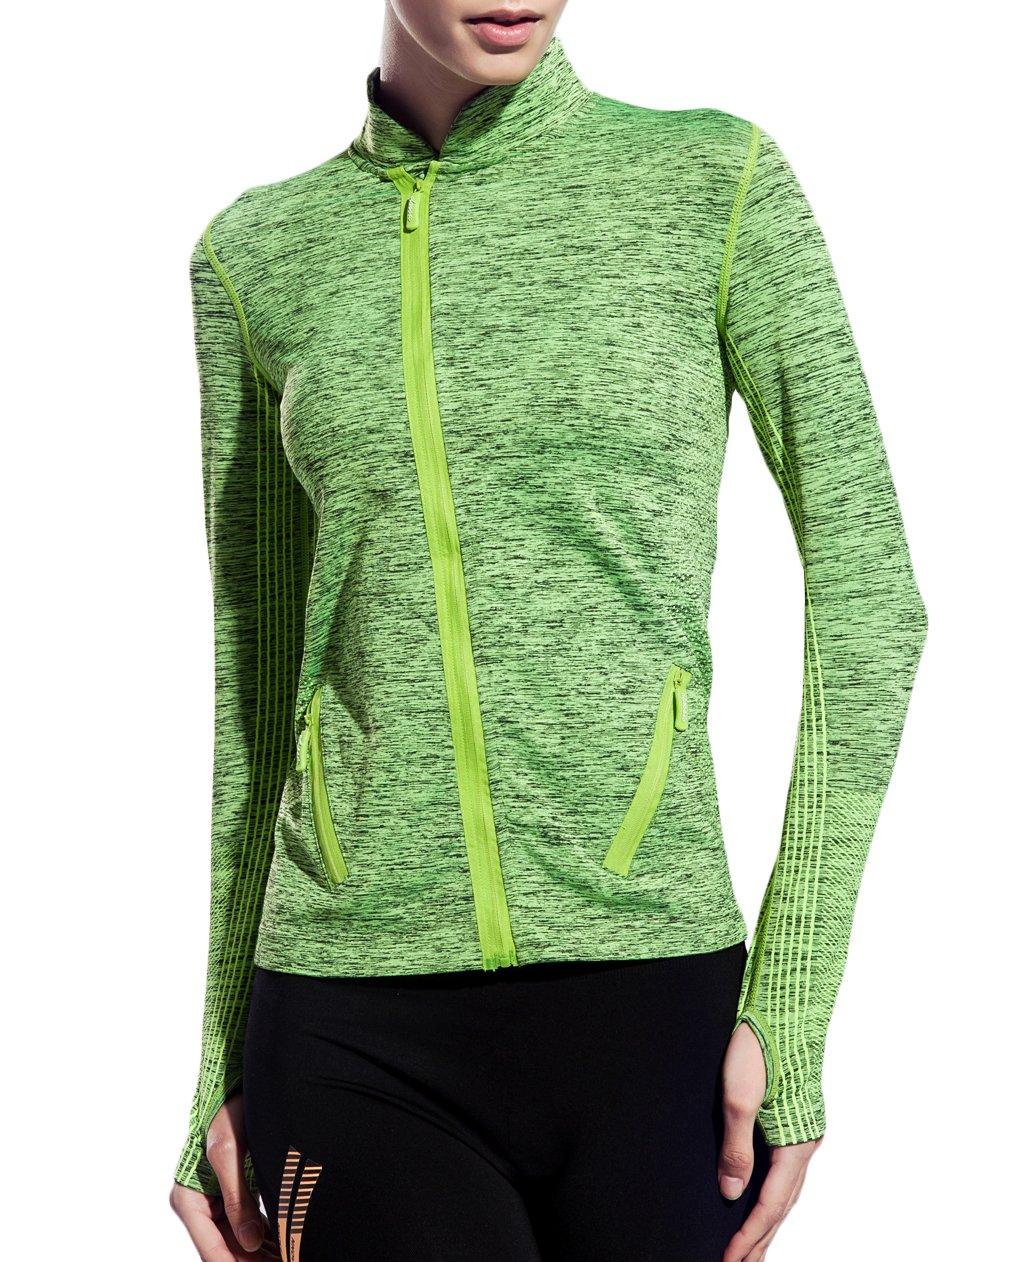 UDIY Women Athletic Sweatshirts, Full-Zip Gym Jacket Coat with Two Size Pocket,Green